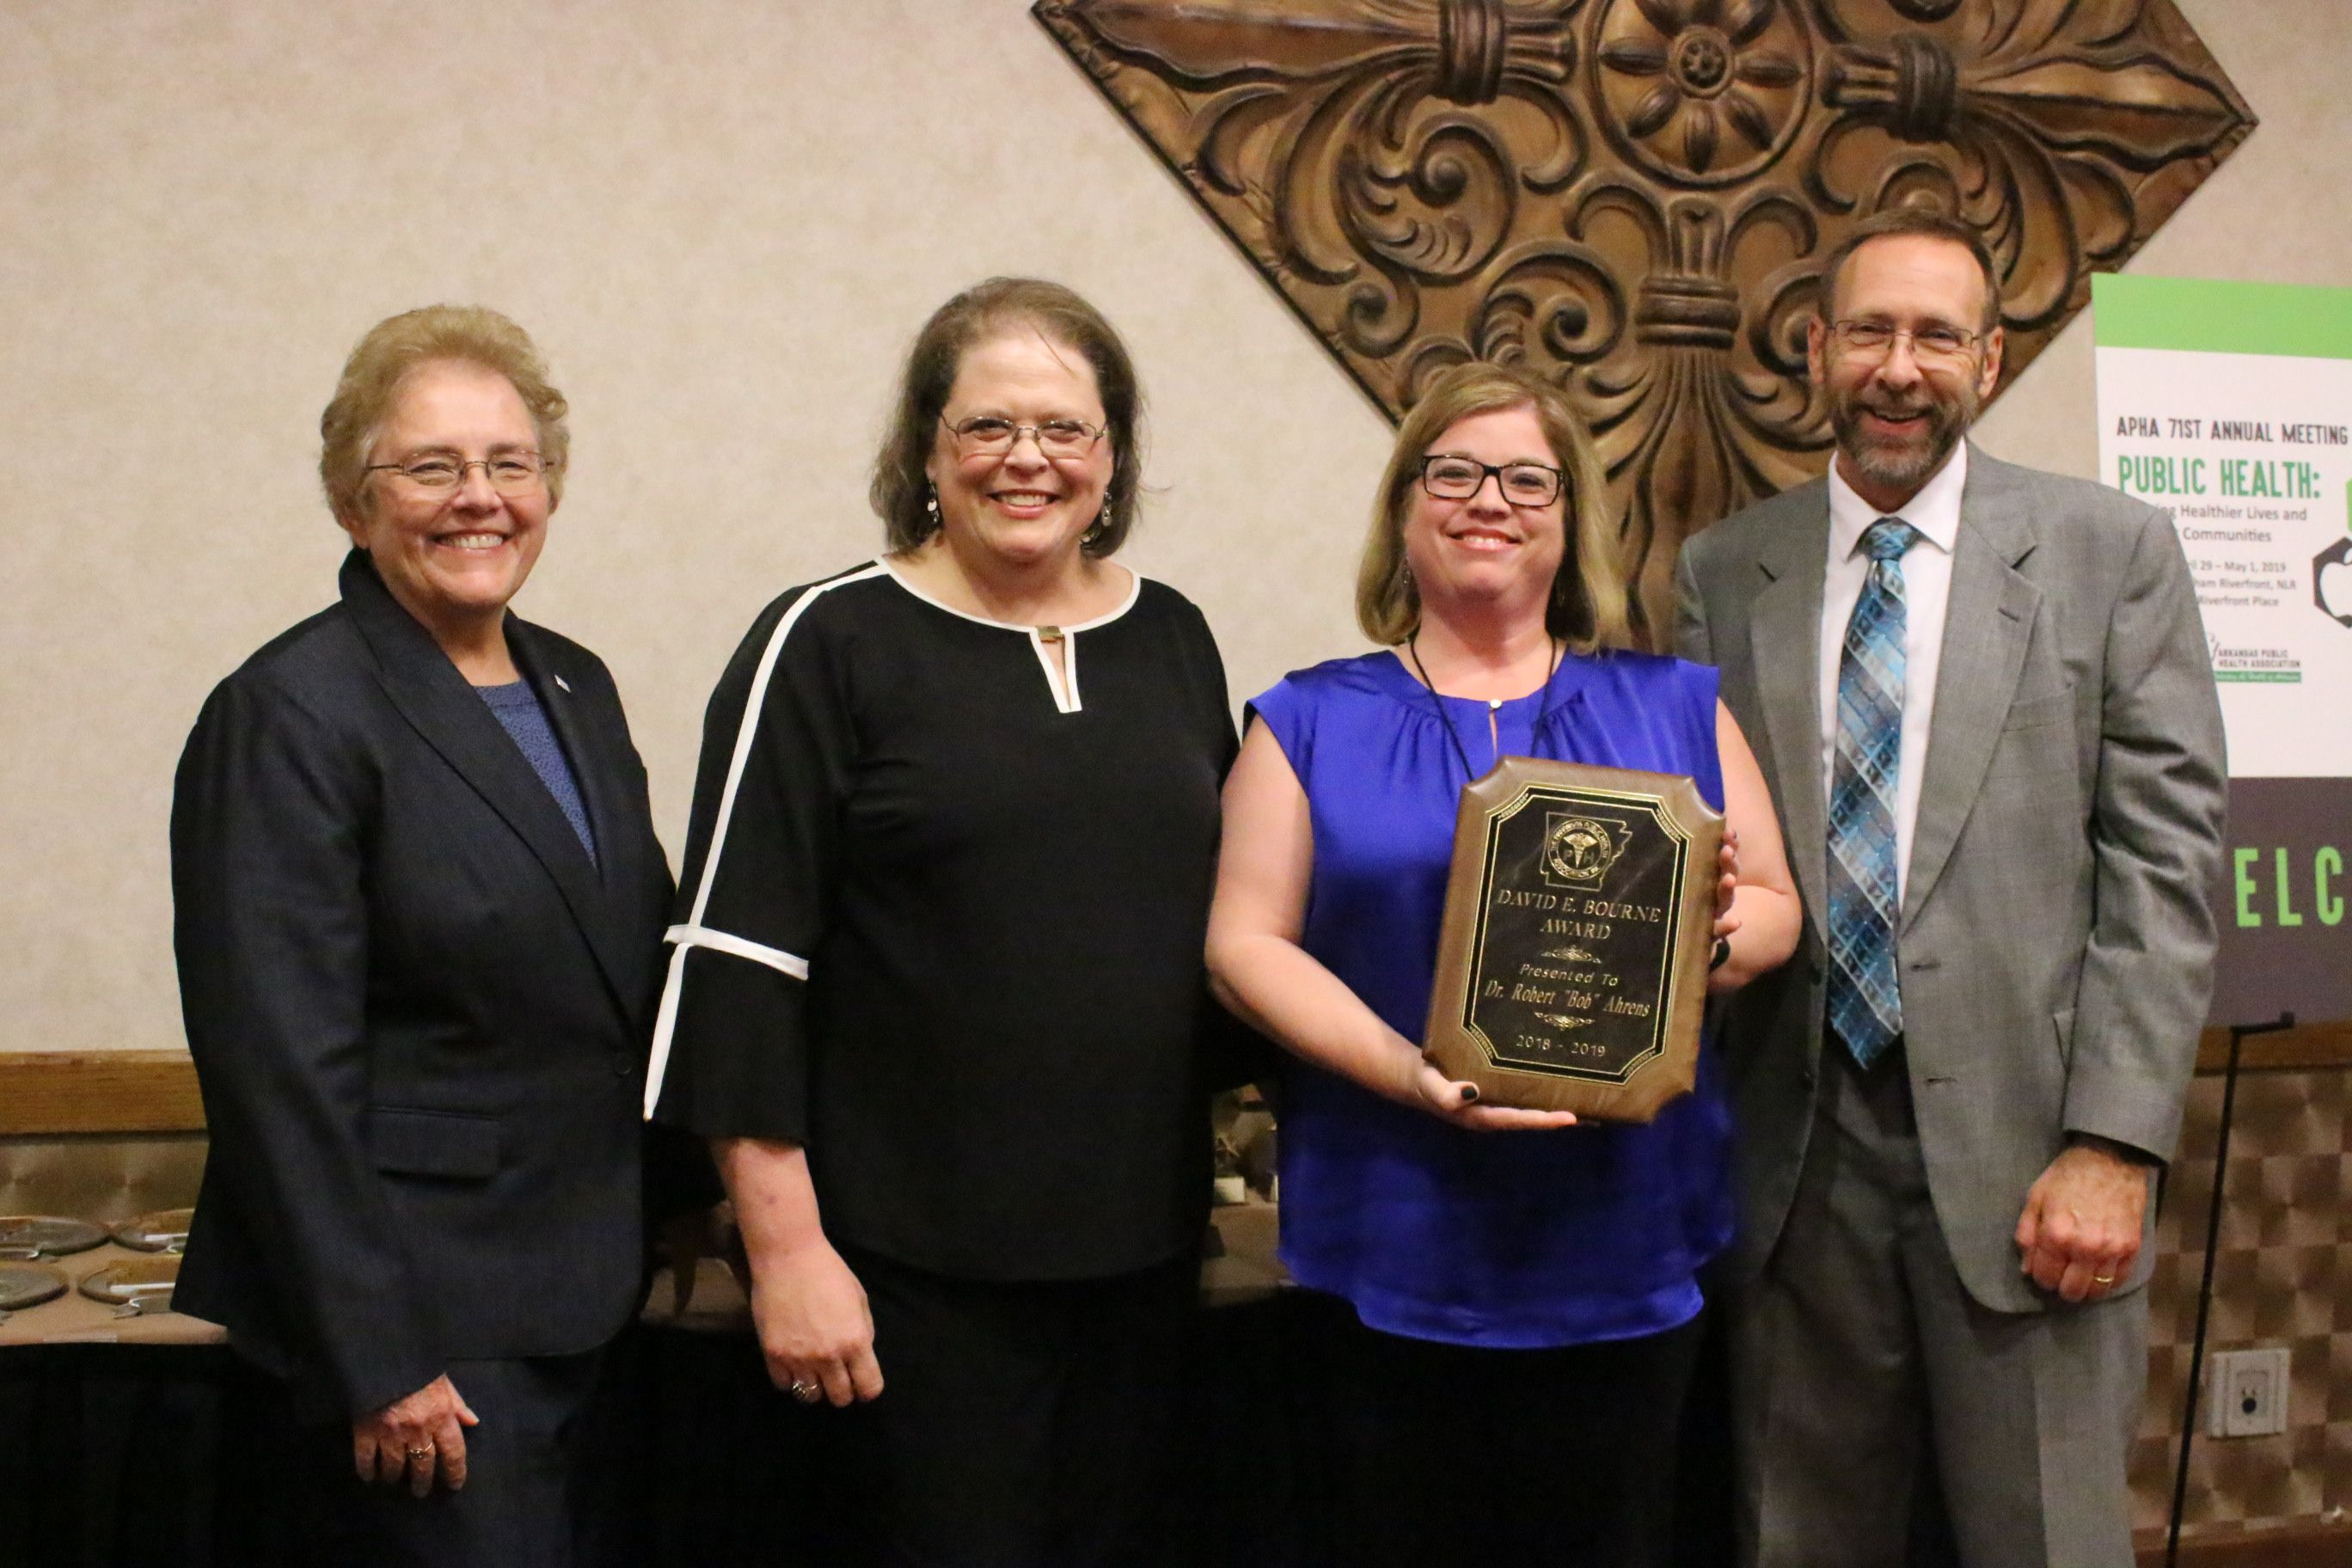 APHA David E. Bourne Award